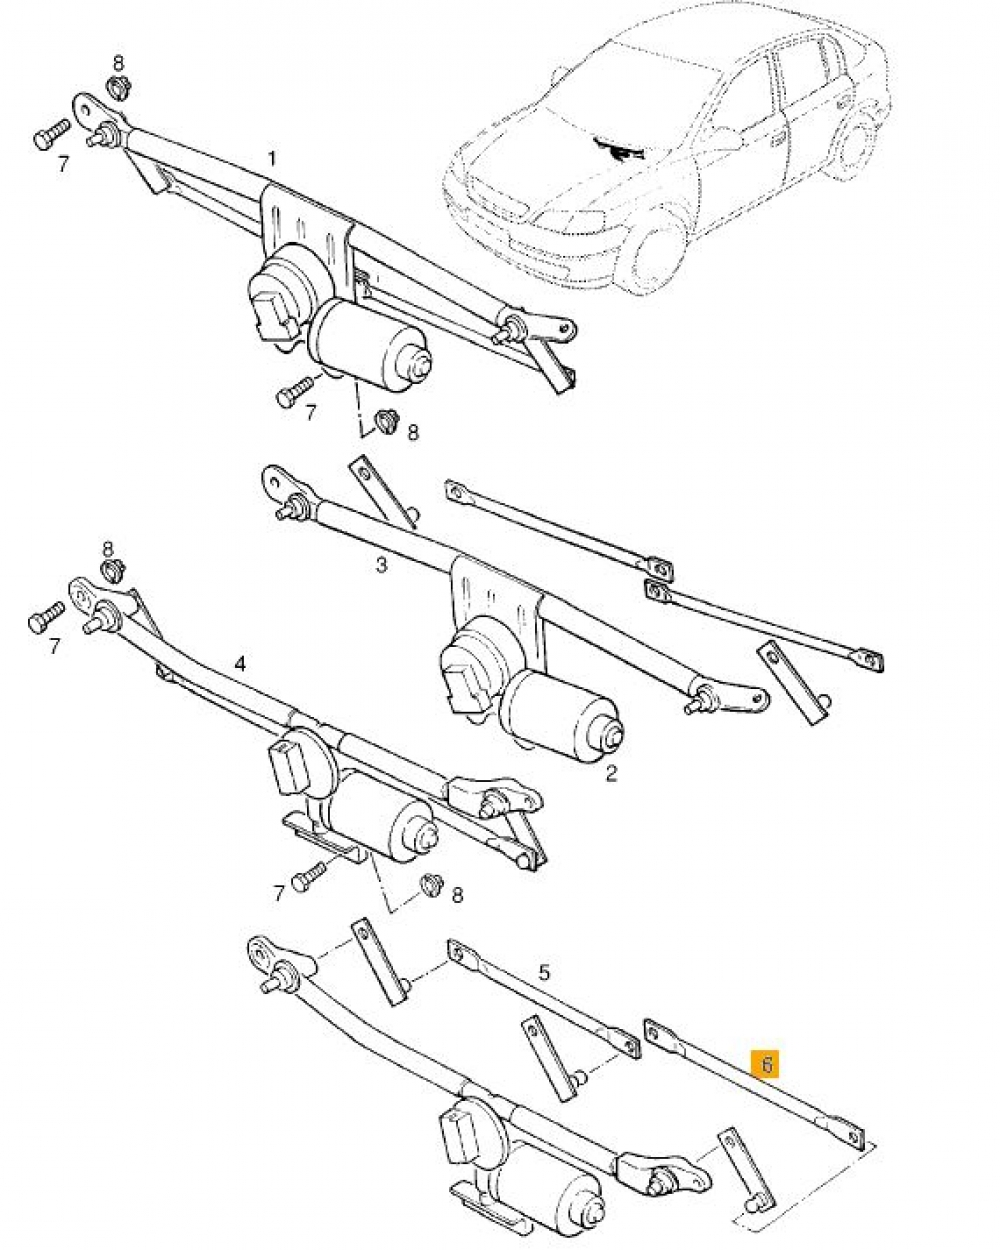 Tija Ansamblu Stergator Opel Astra G Gm Partea Stanga (sofer)